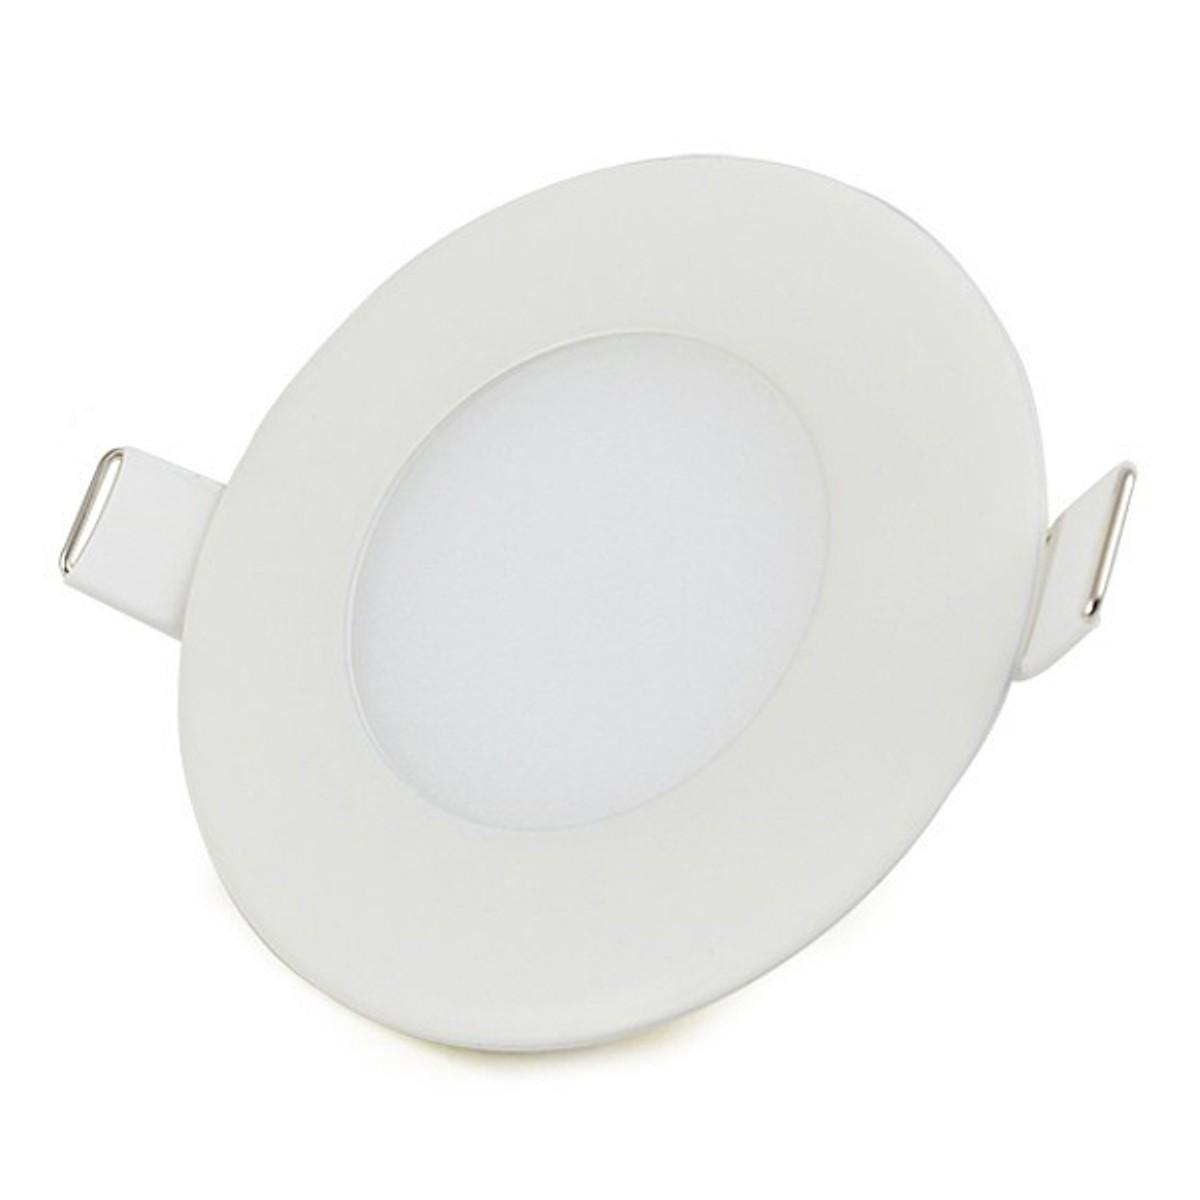 ĐÈN LED Âm Trần Suntek 3W